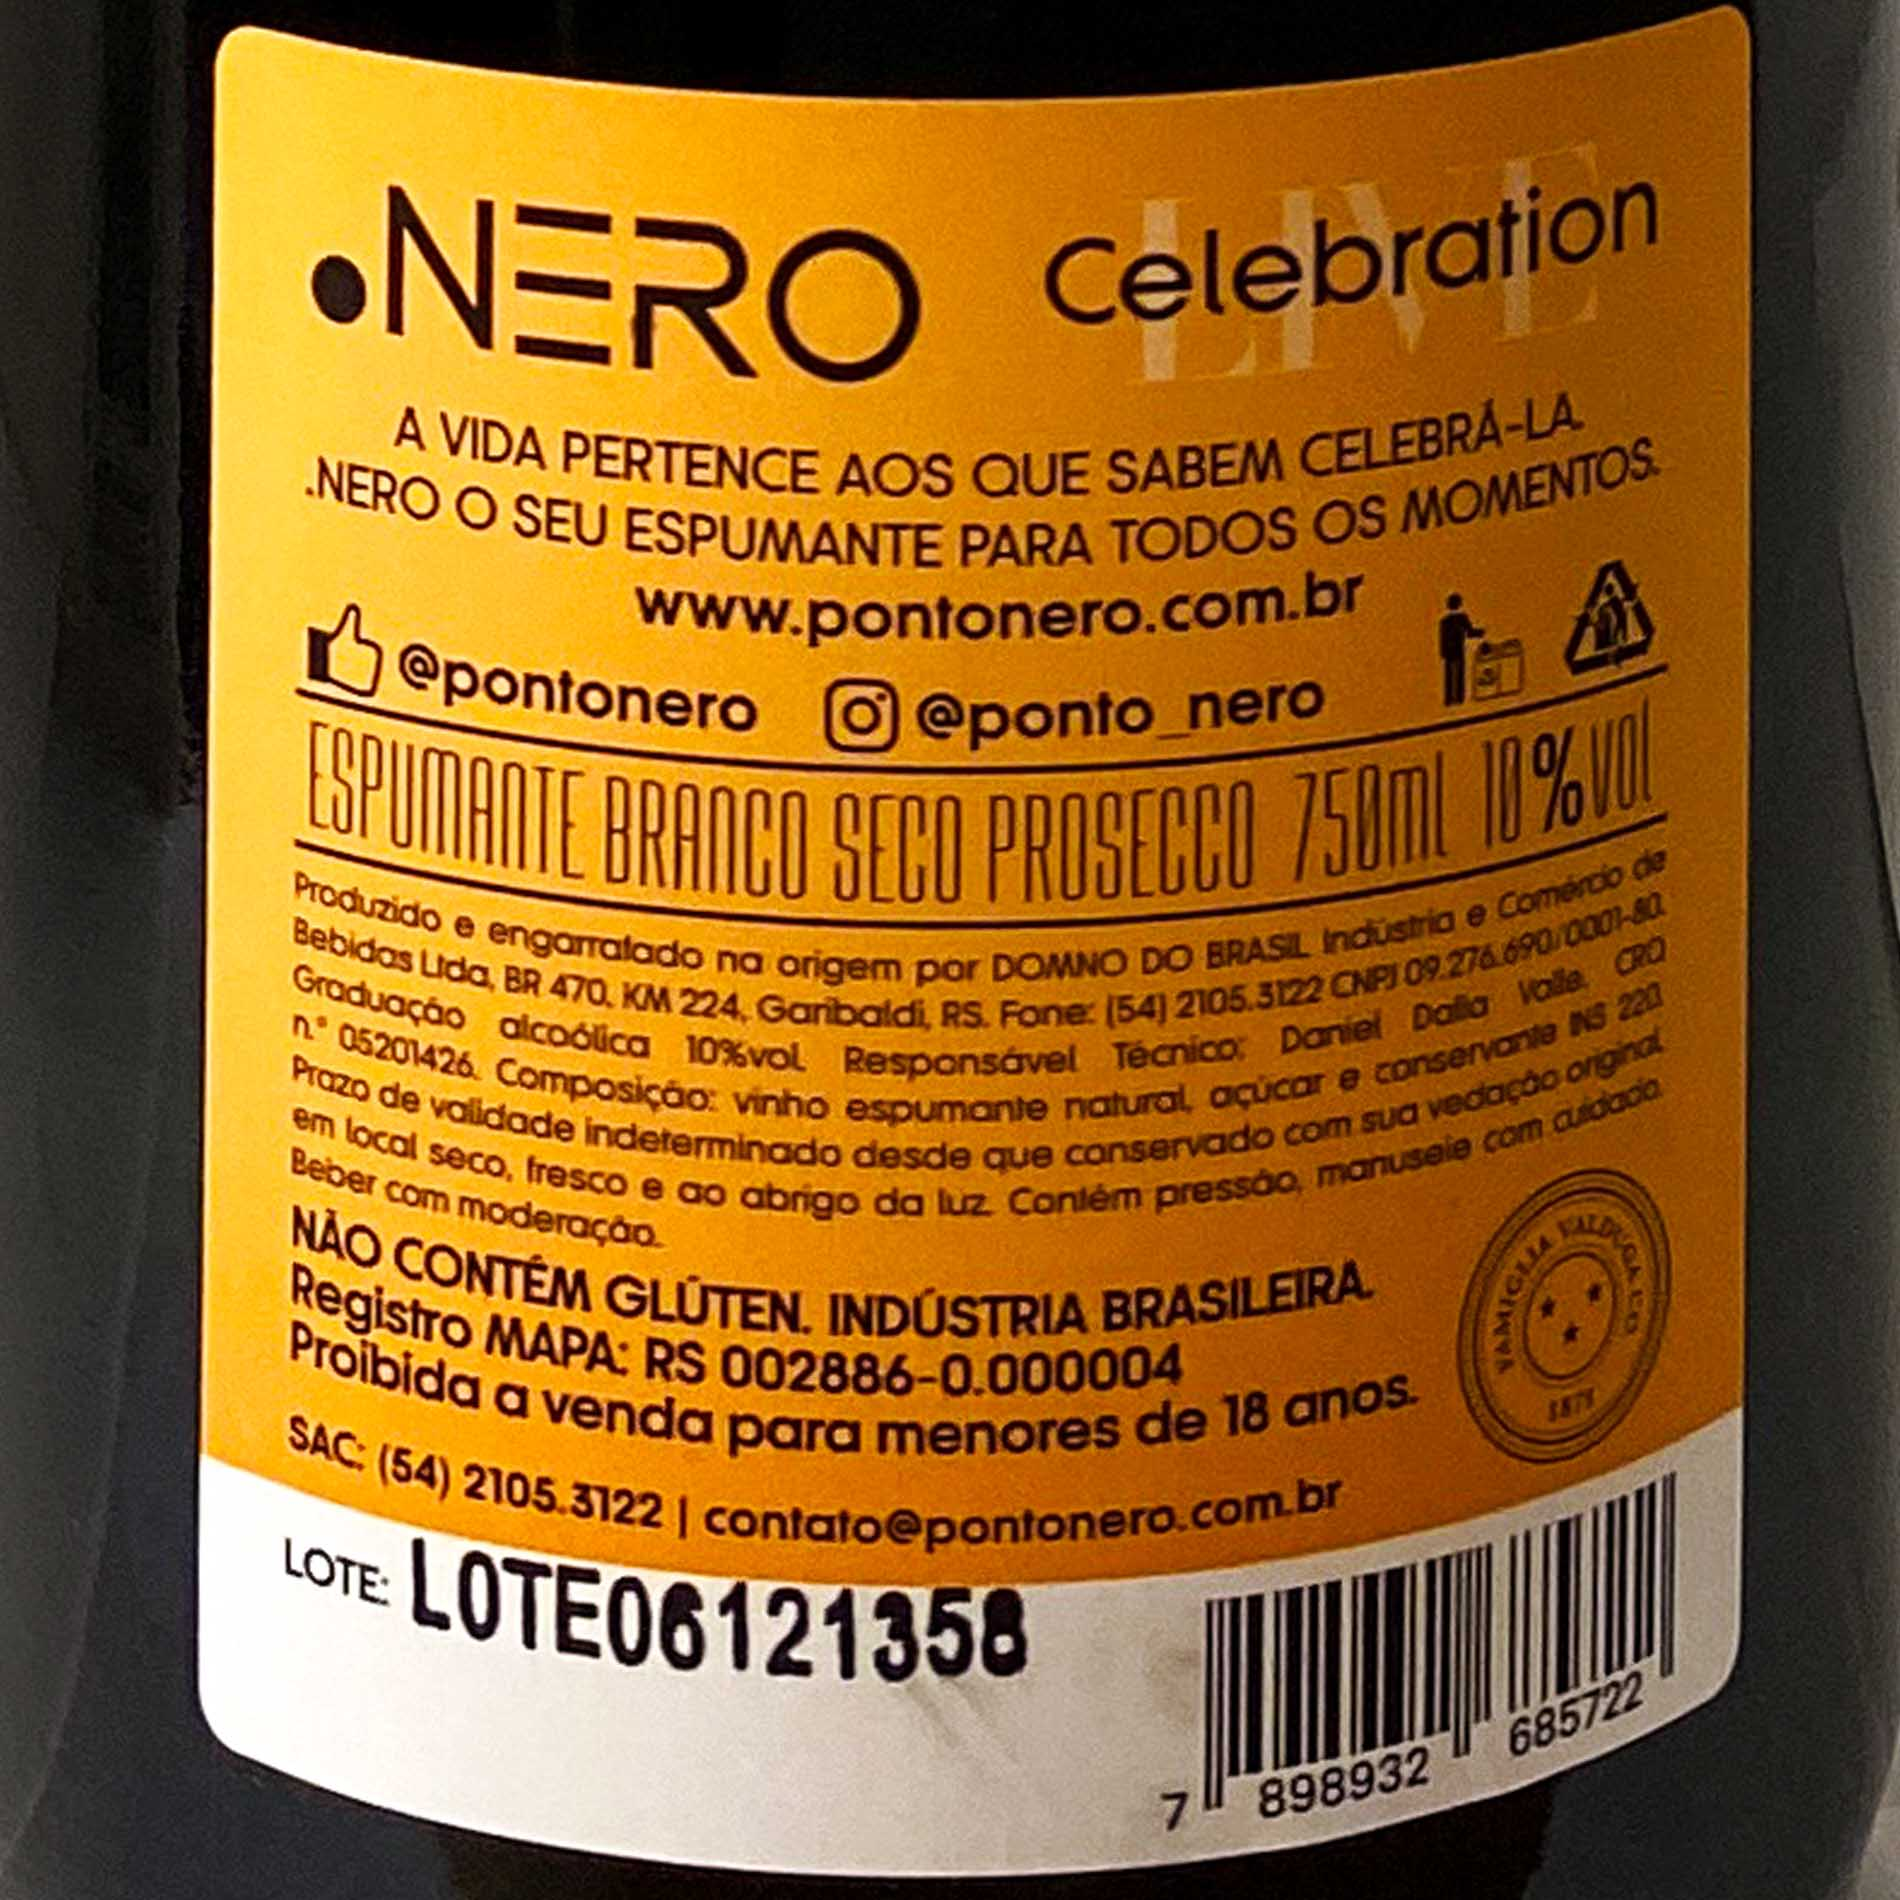 Ponto Nero Live Celebration Glera (Prosecco)  - Vinerize